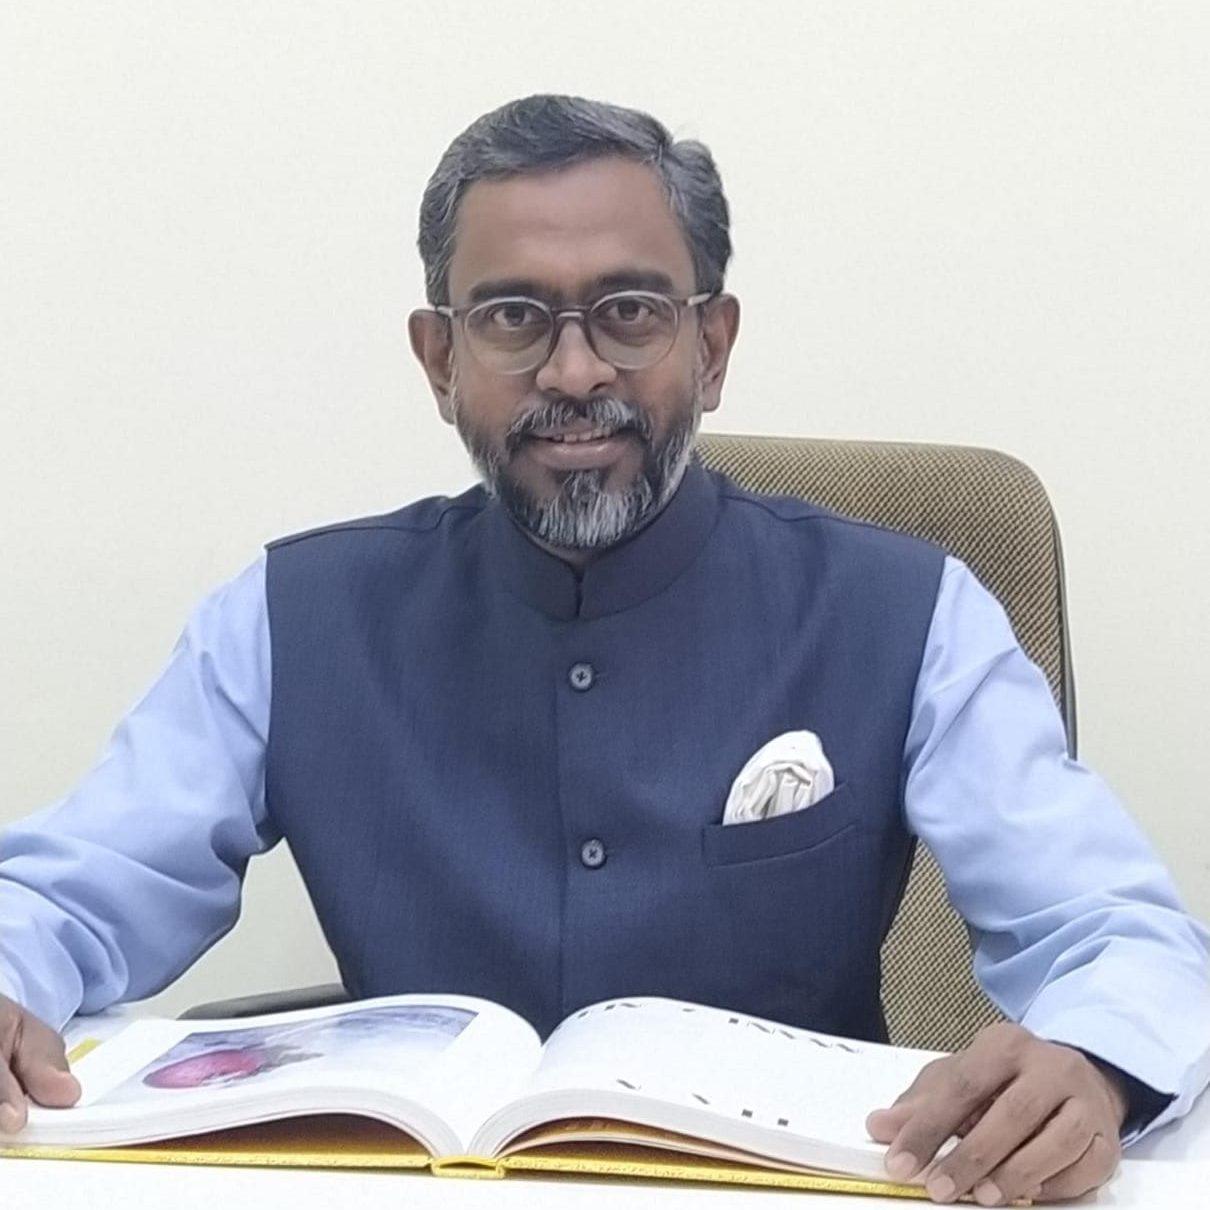 Dr. Satish Jayaram 1 edited Webinar on Glorious GMs 2.0 - Leading The Way